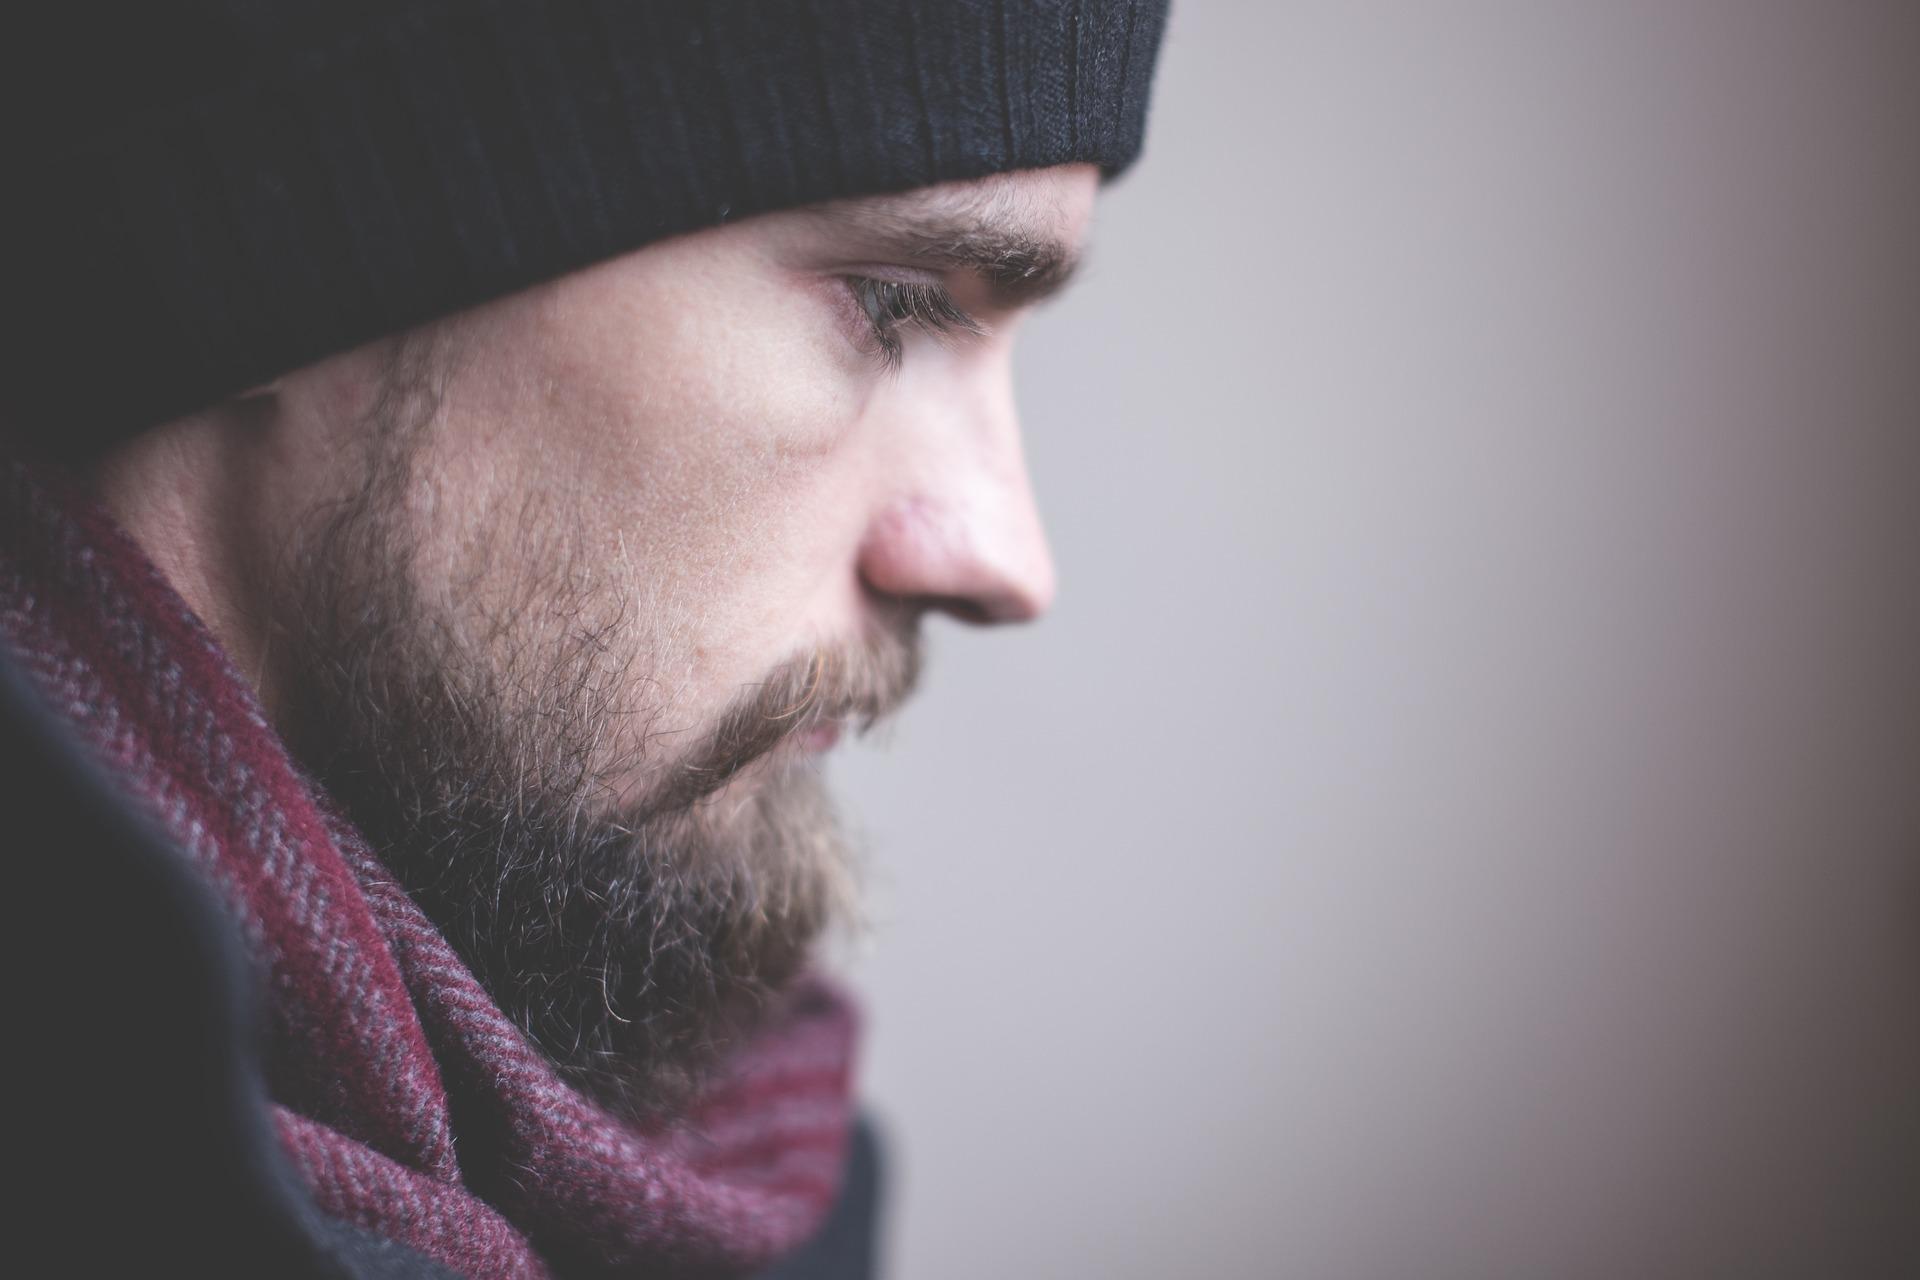 Adult, beard, face